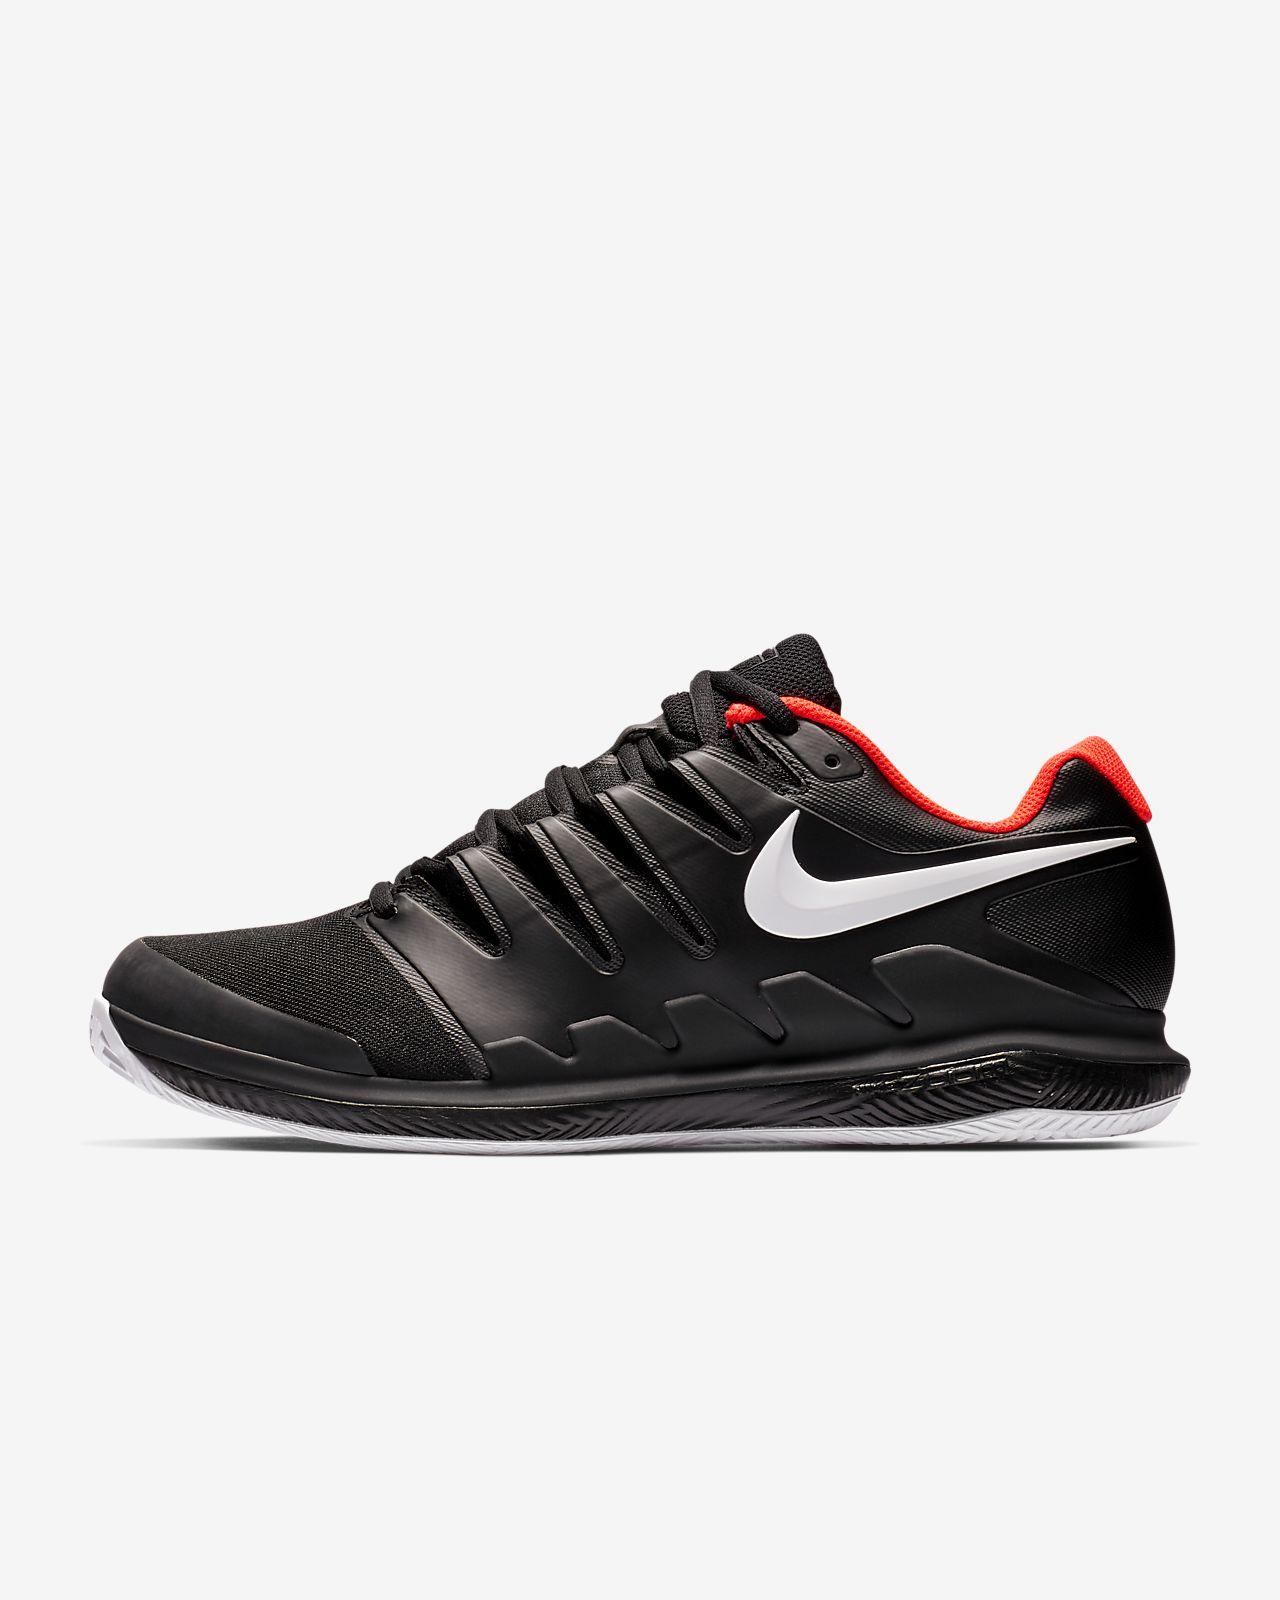 NikeCourt Air Zoom Vapor X Men's Clay Tennis Shoe